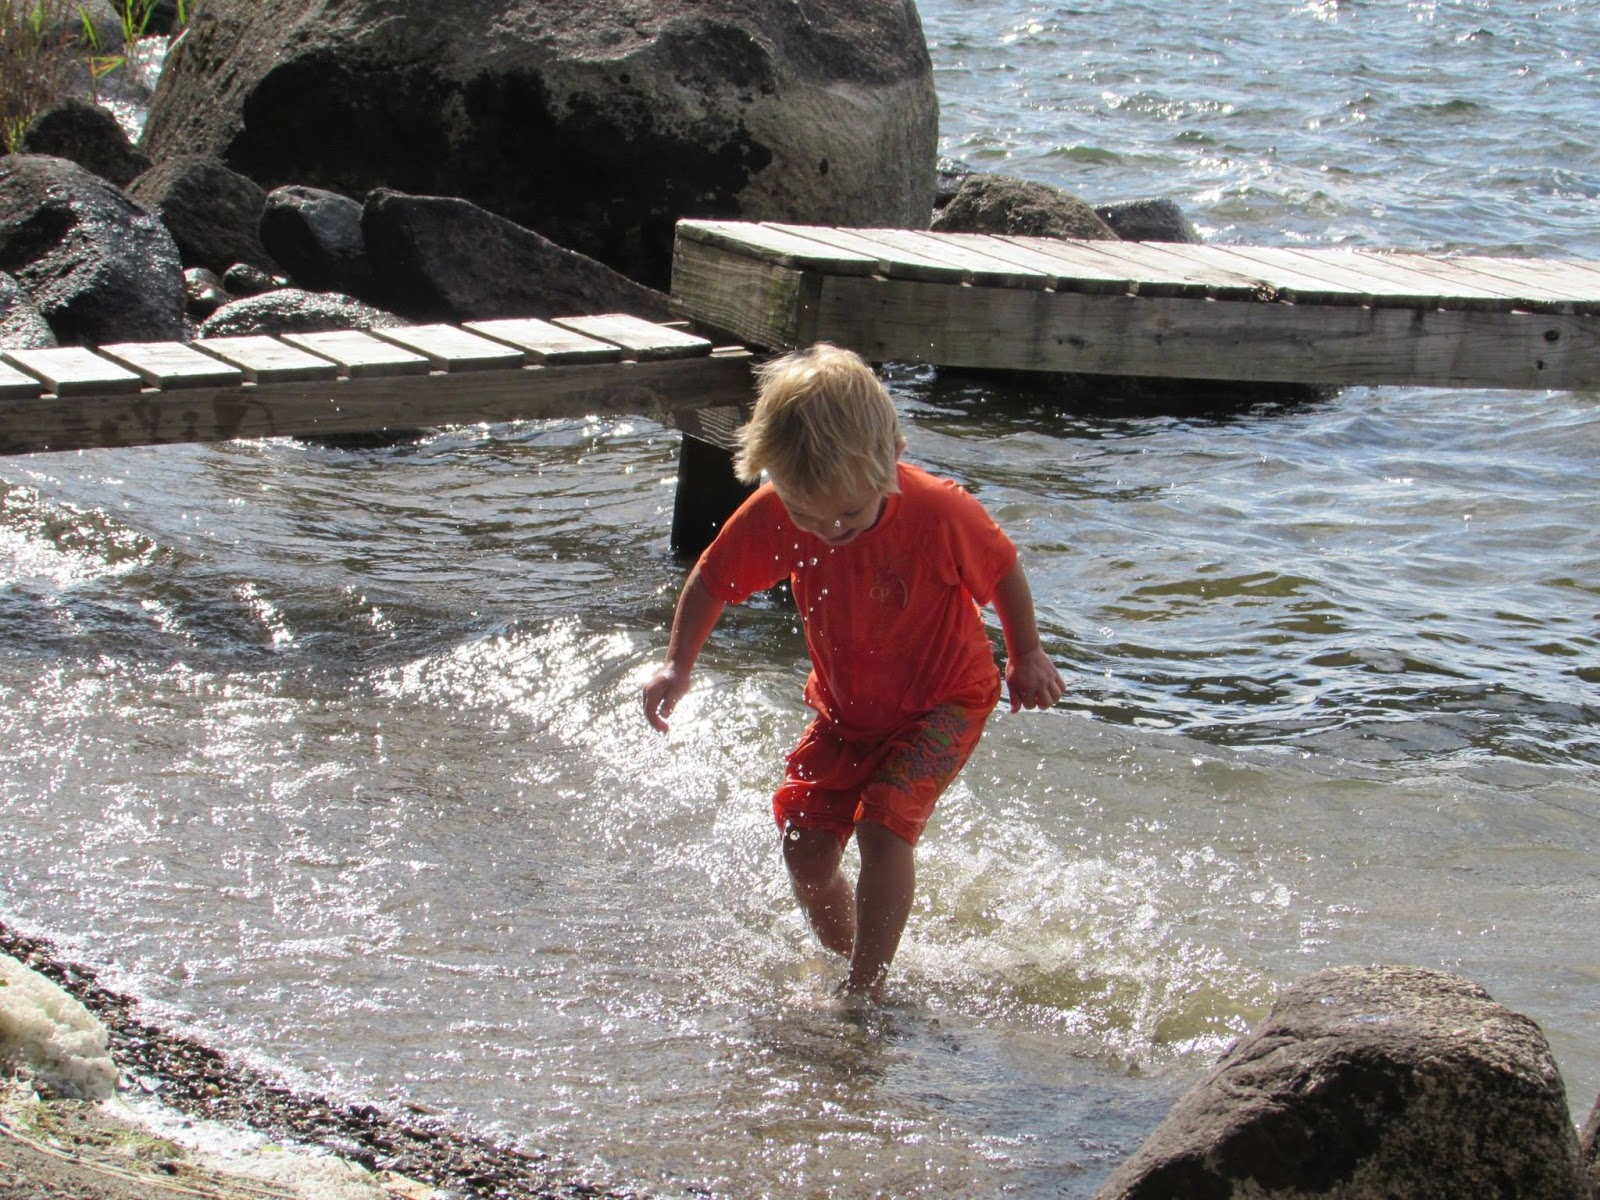 Enjoying water time in the Atlantic Ocean